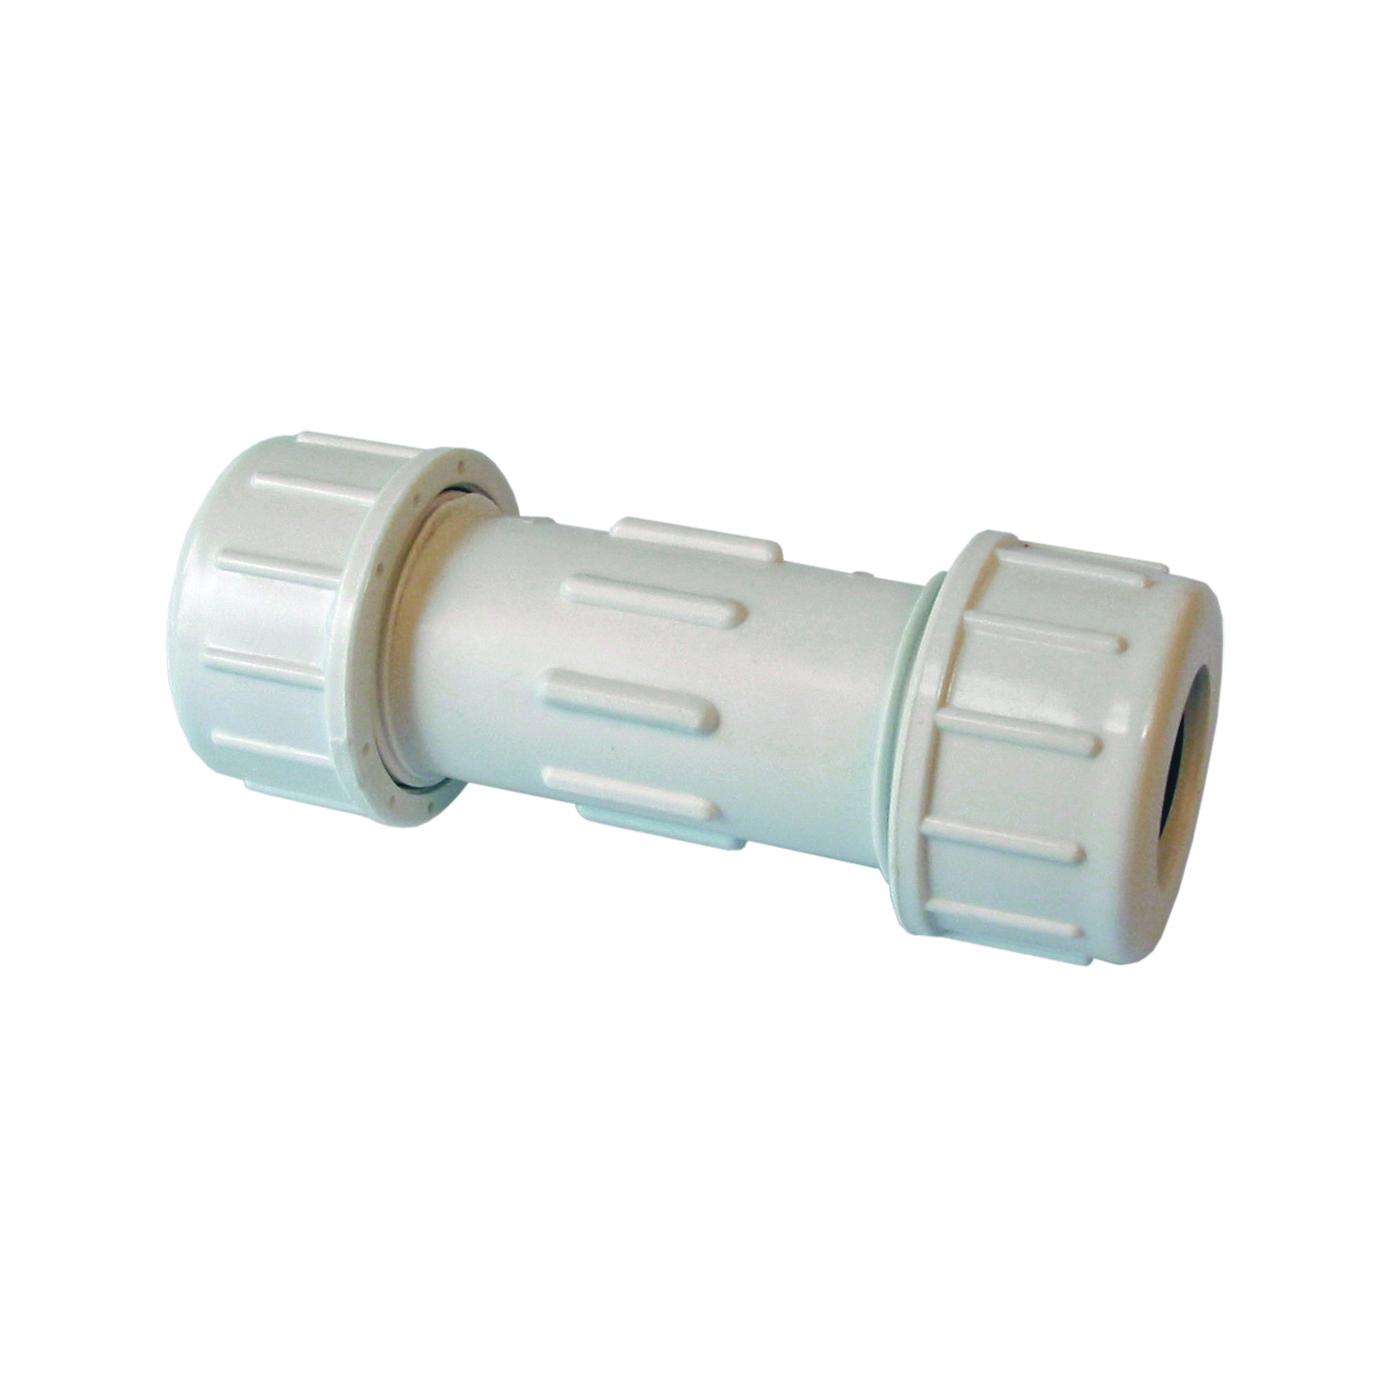 Picture of AMERICAN VALVE P600U 2-1/2 Compression Coupler, 2-1/2 in, Compression, SCH 40 Schedule, 150 psi Pressure